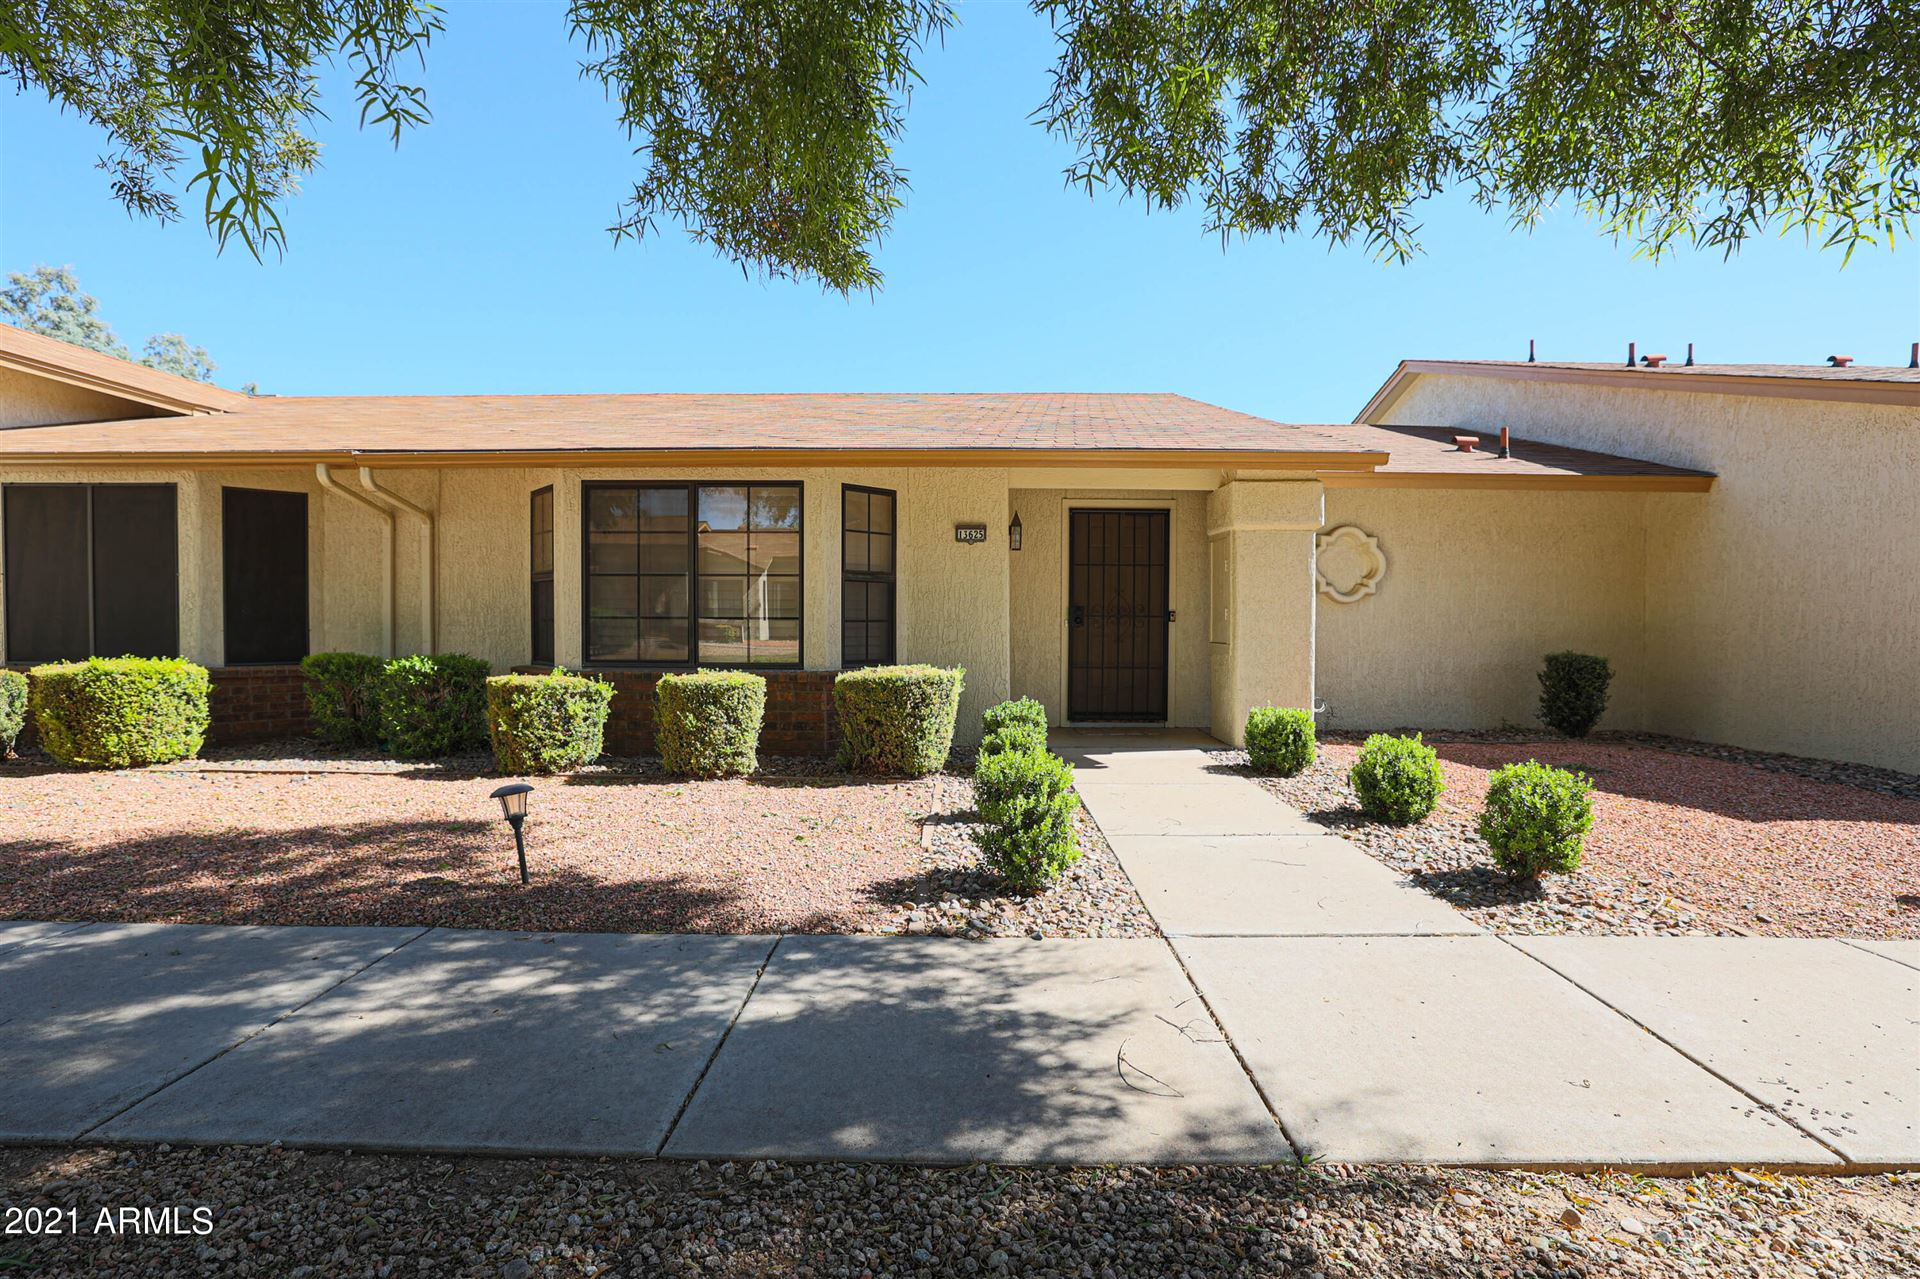 Photo of 13625 W Bolero Drive, Sun City West, AZ 85375 (MLS # 6306973)